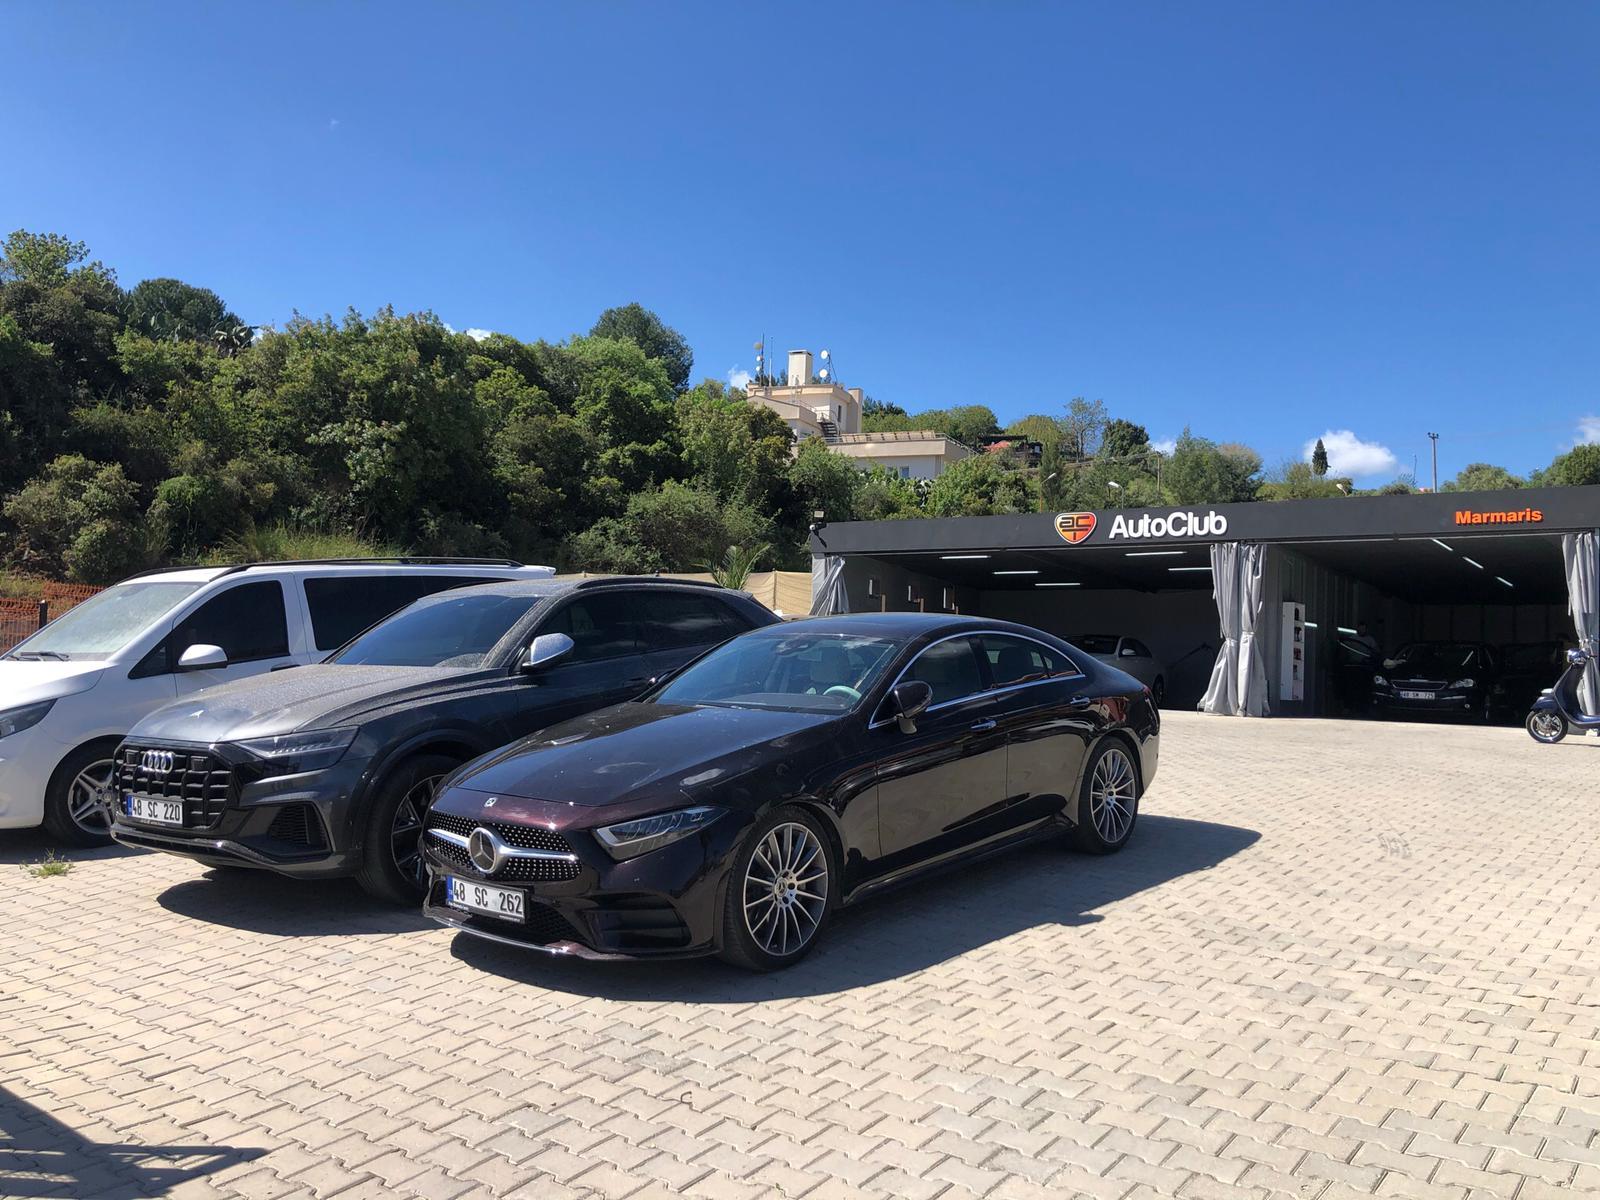 AutoClub Marmaris - Muğla Marmaris